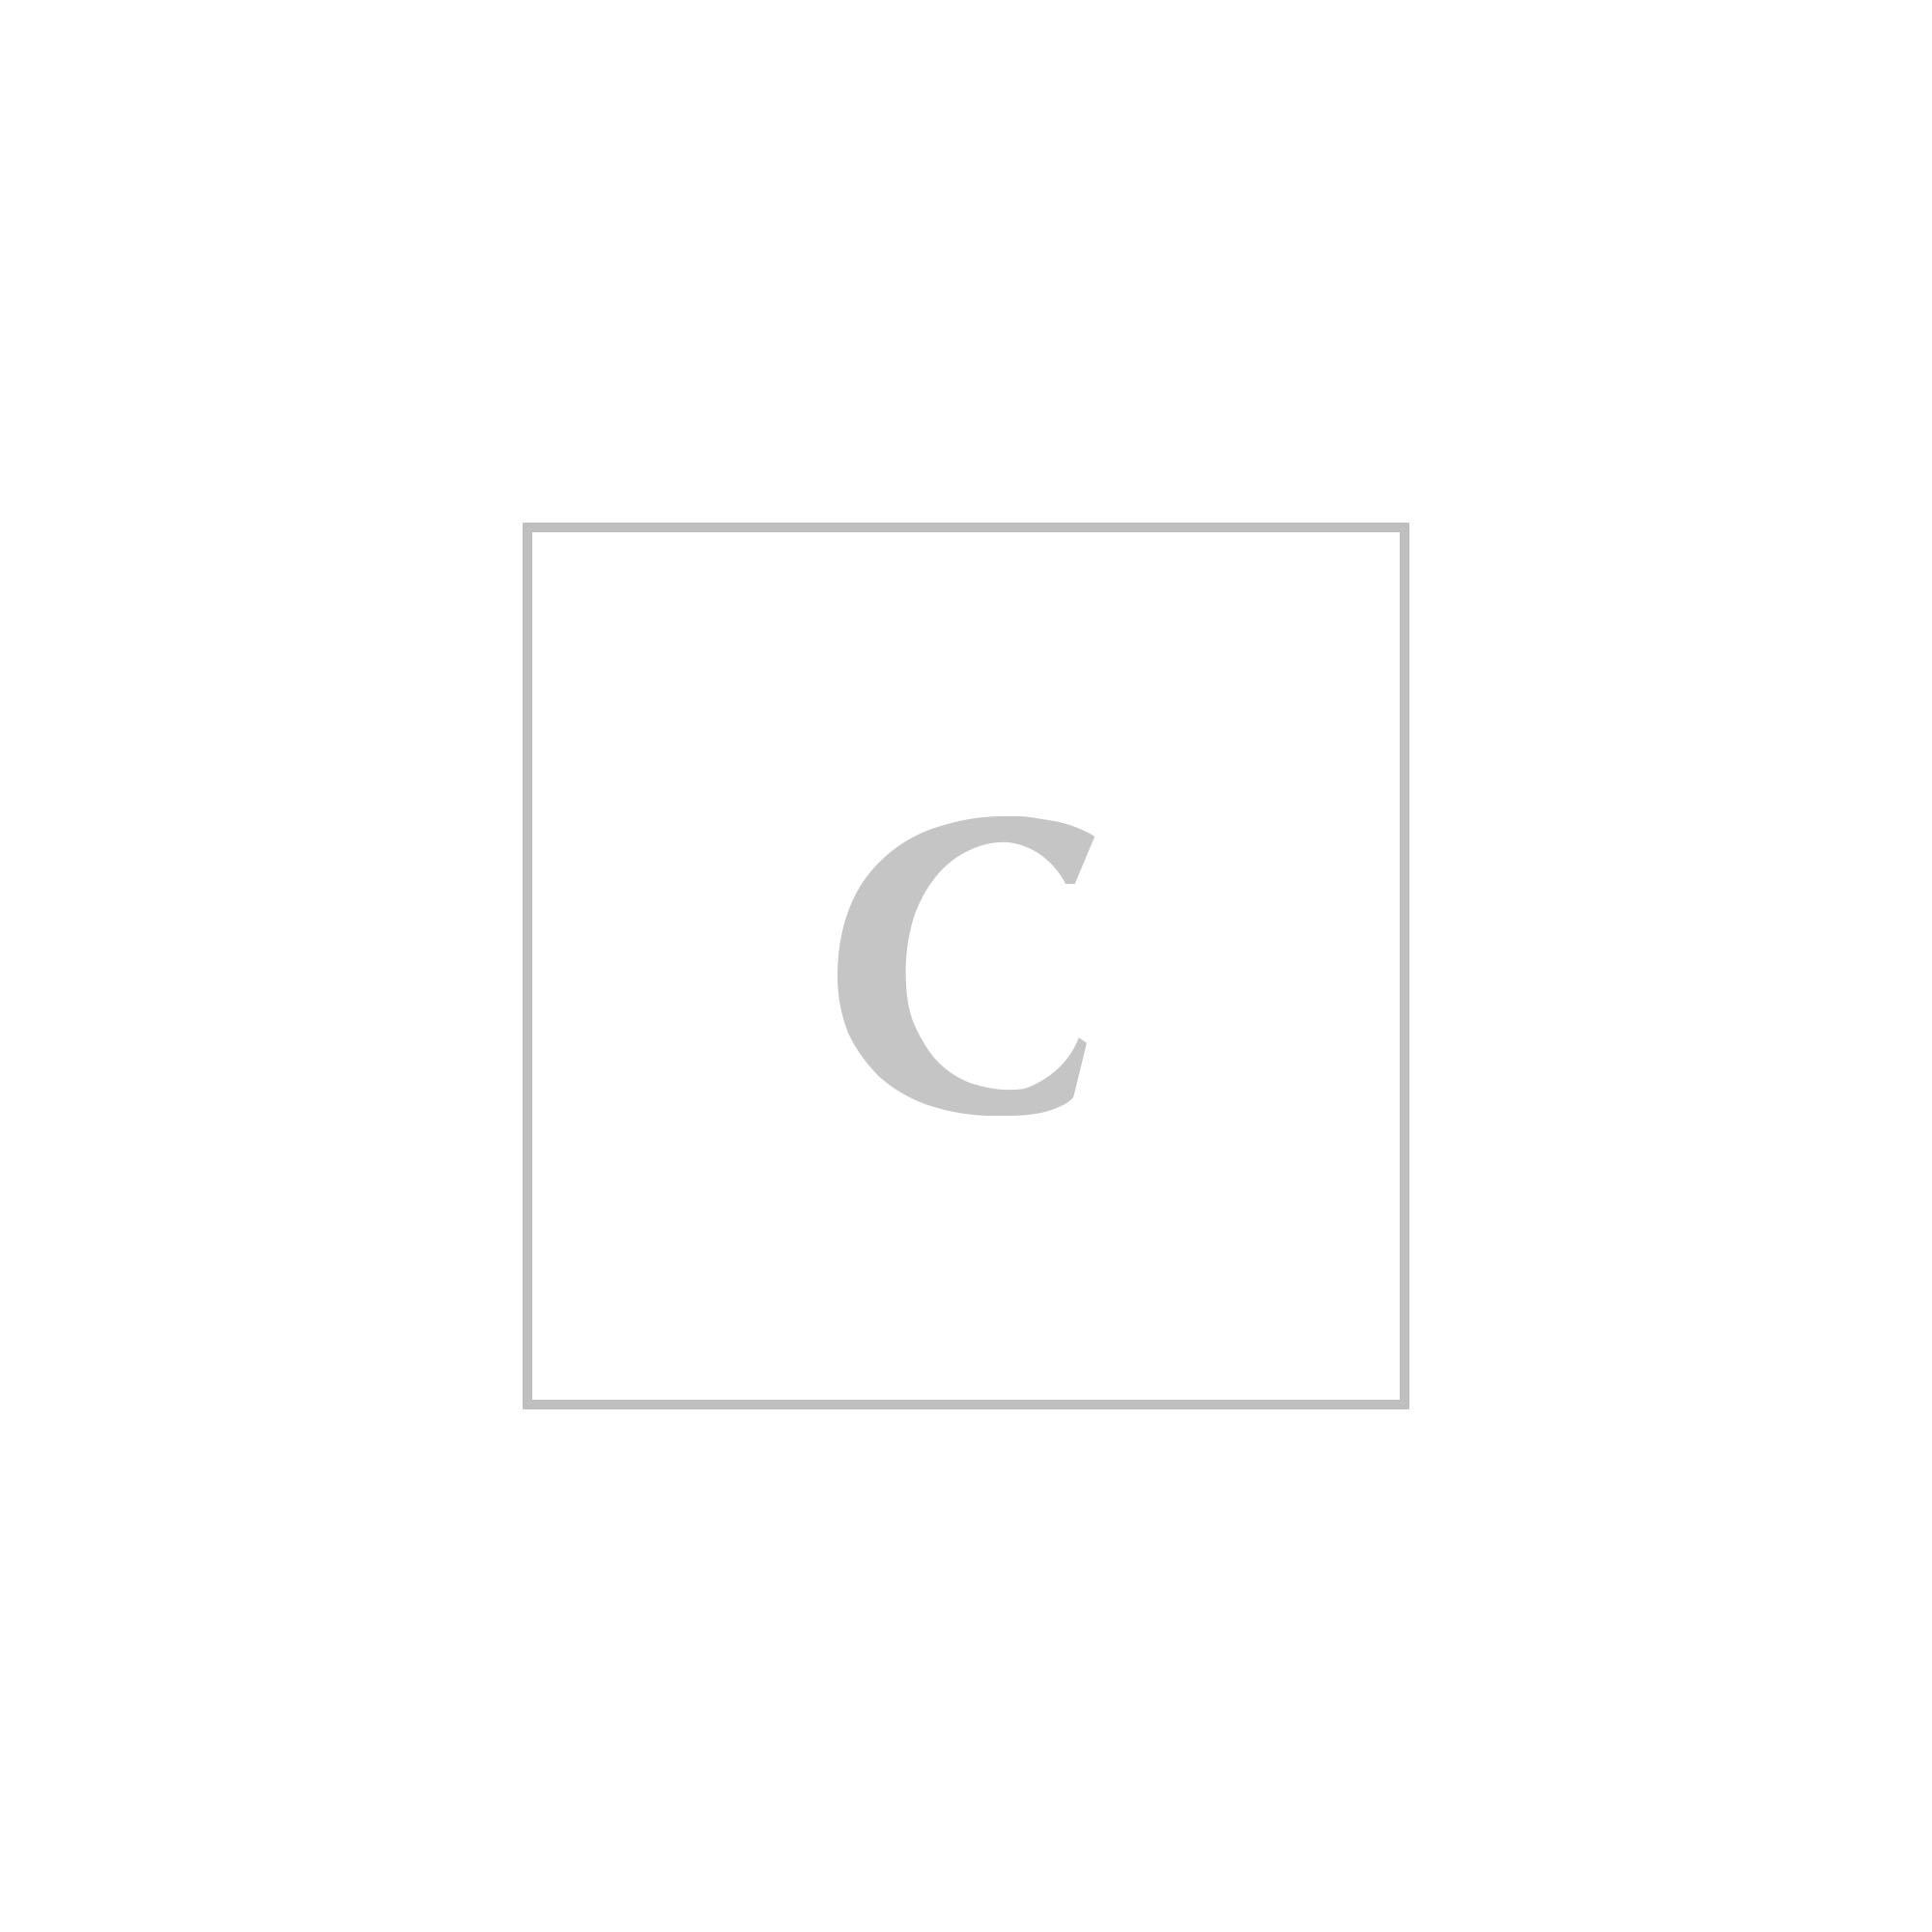 Calvin klein 205w39nyc oversize university pullover